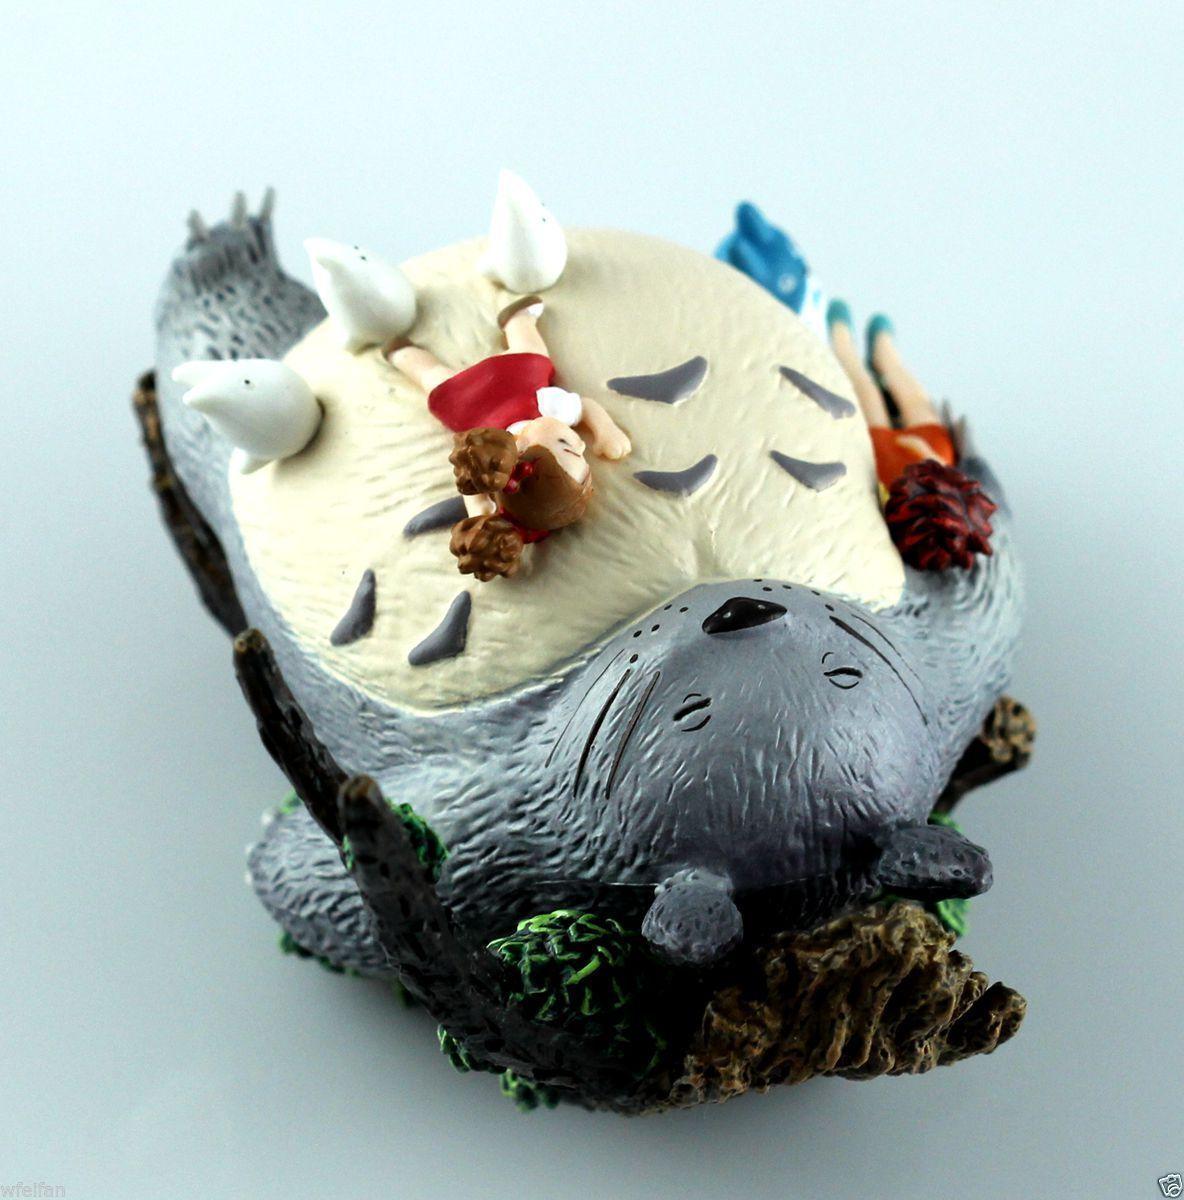 STUDIO GHIBLI Classic My New Neighbor Totoro Figures Scene Figurine Gift Toy Children free shipping